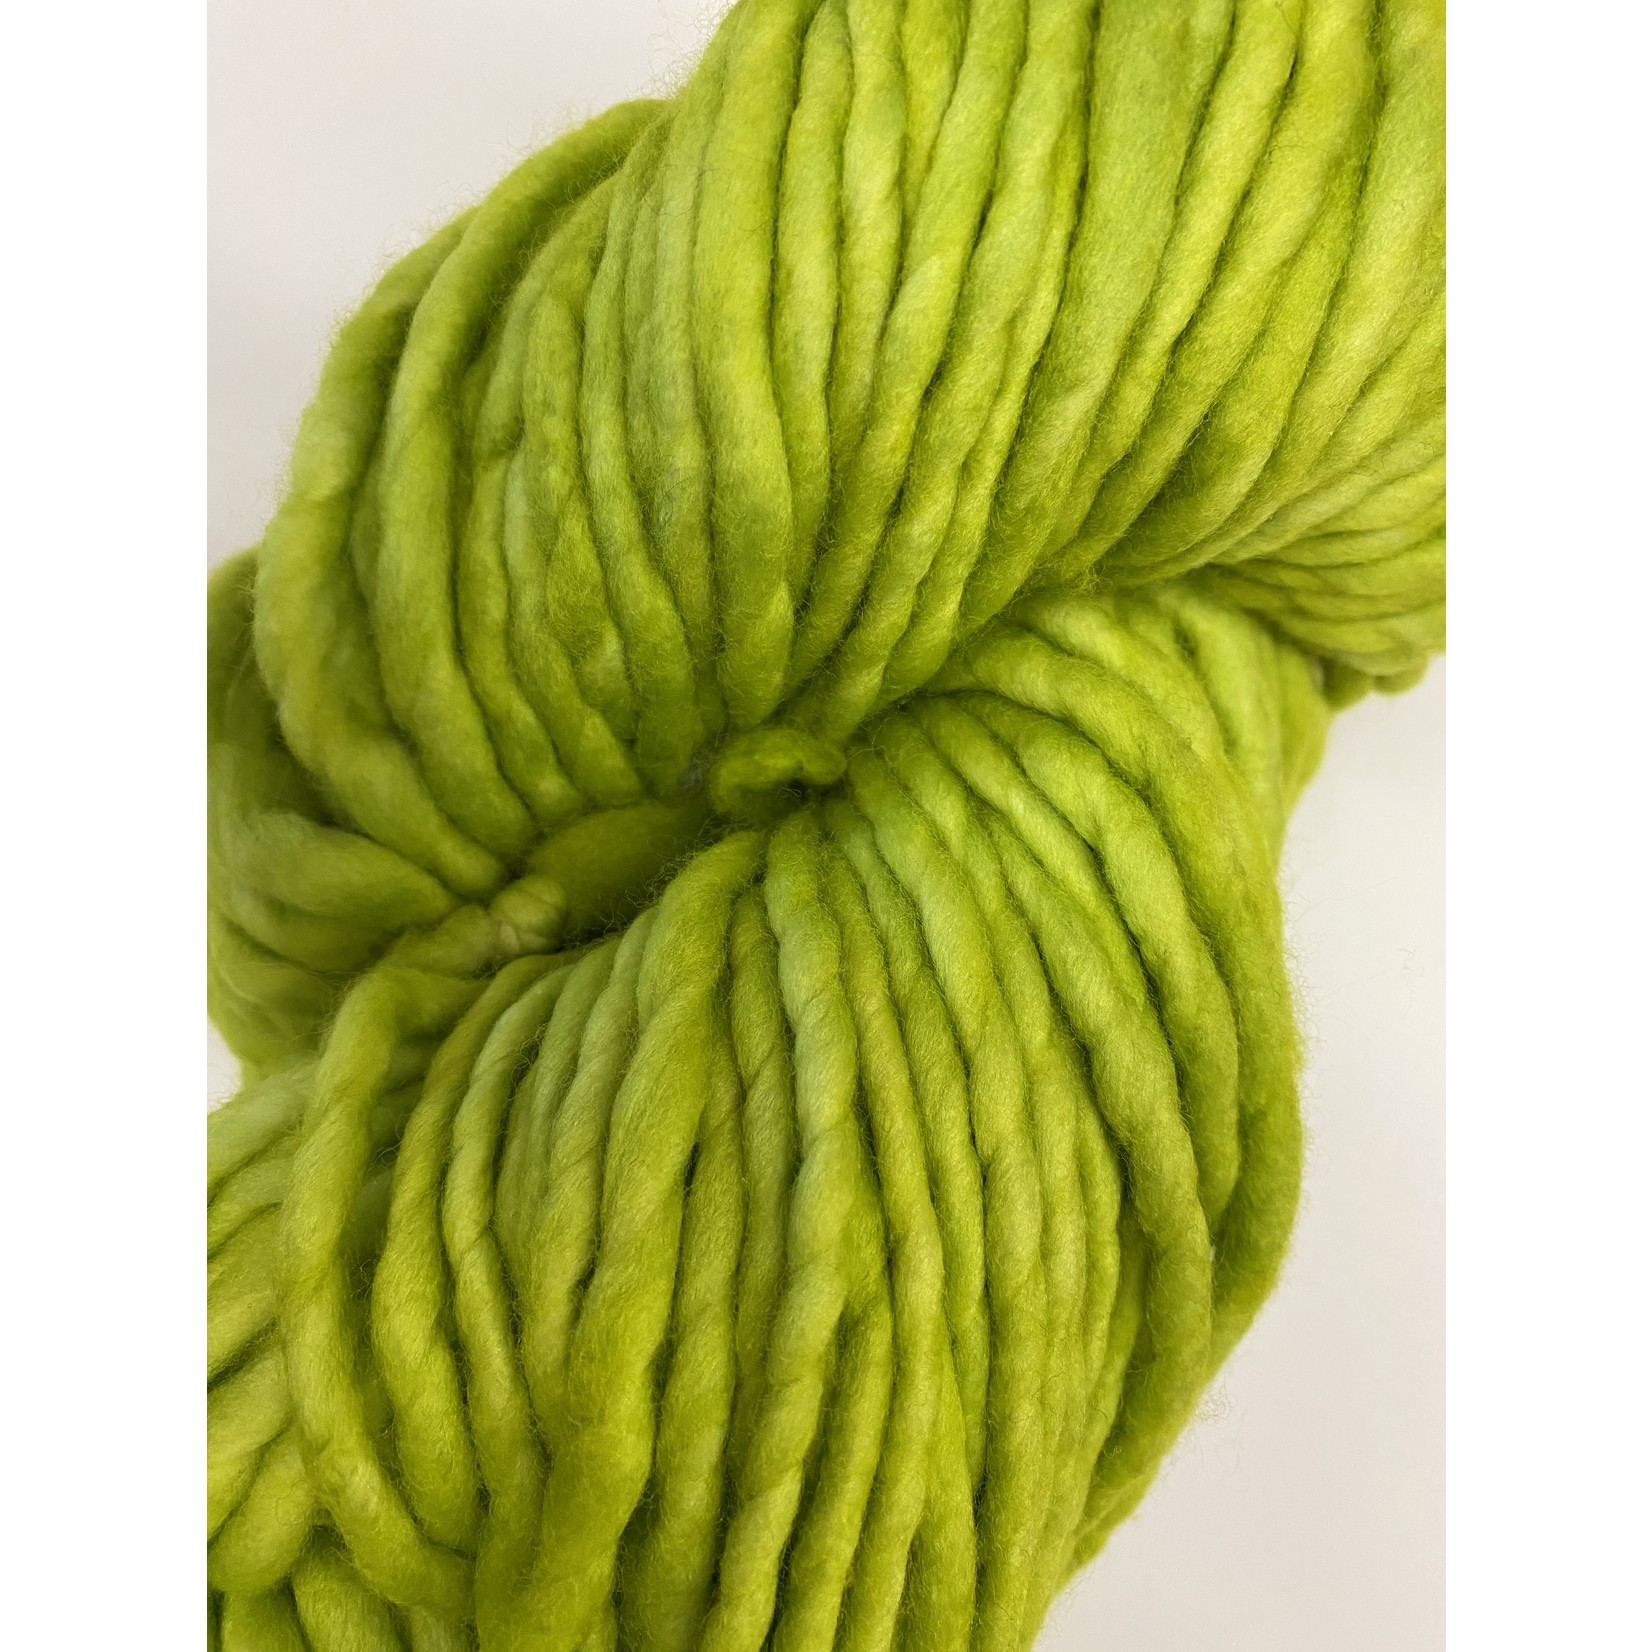 Malabrigo Rasta, RAS011 Apple Green